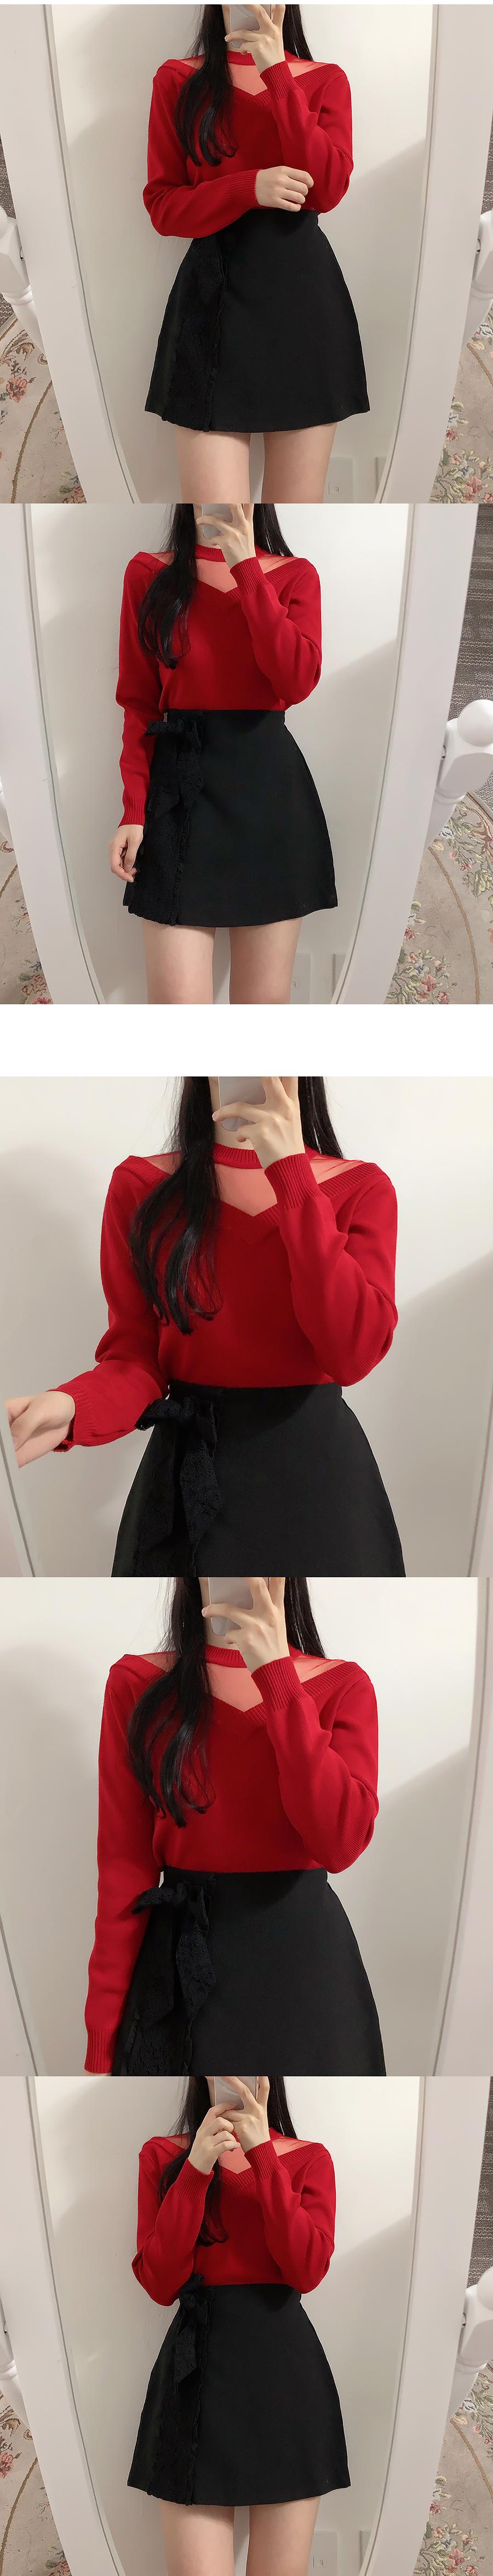 Zeny lace ribbon skirt pants